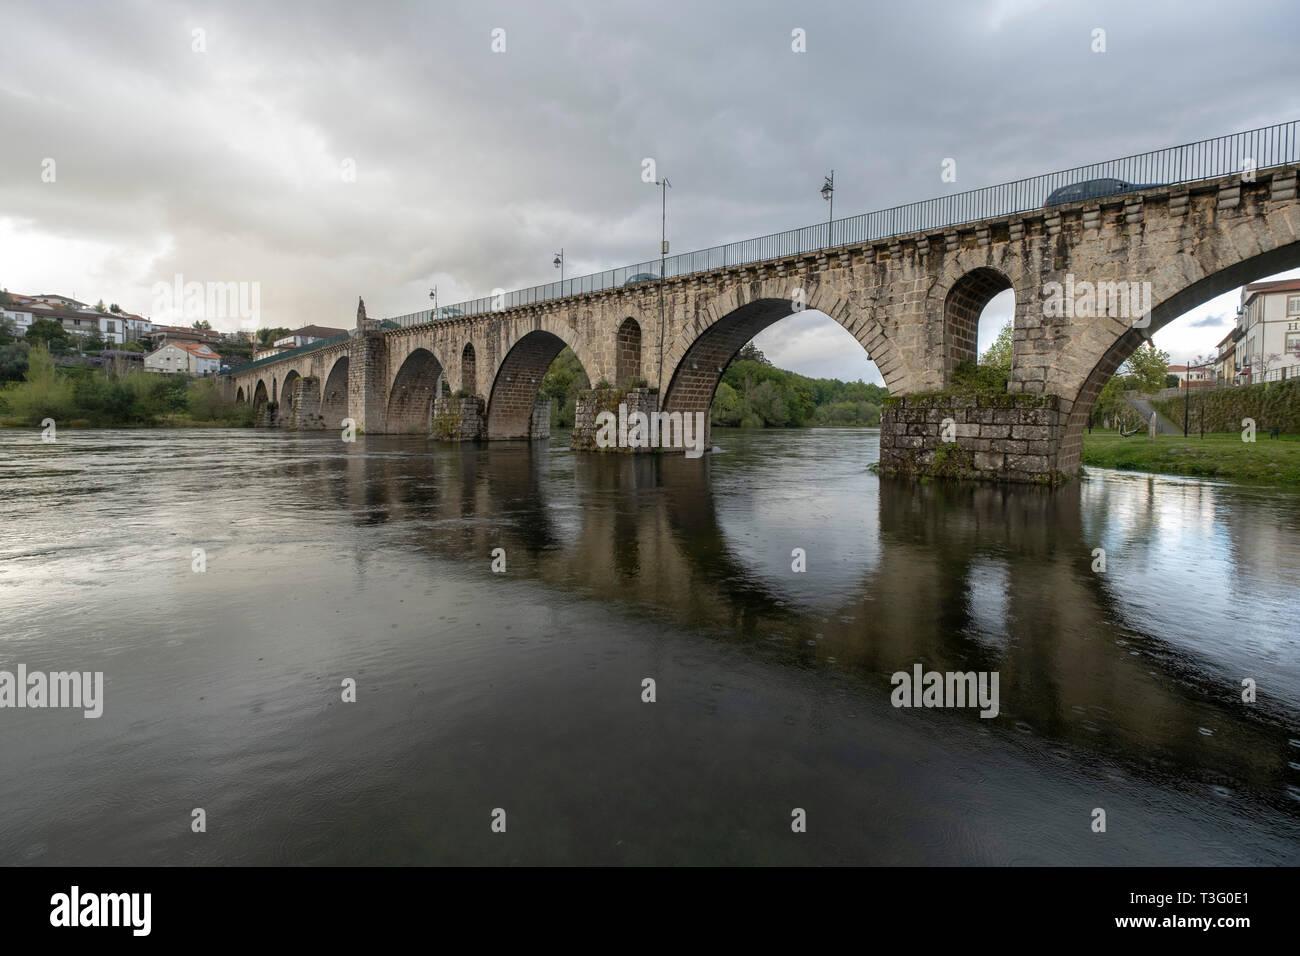 Medieval stone bridge over the Lima river in Ponte da Barca, Minho, Portugal, Europe - Stock Image